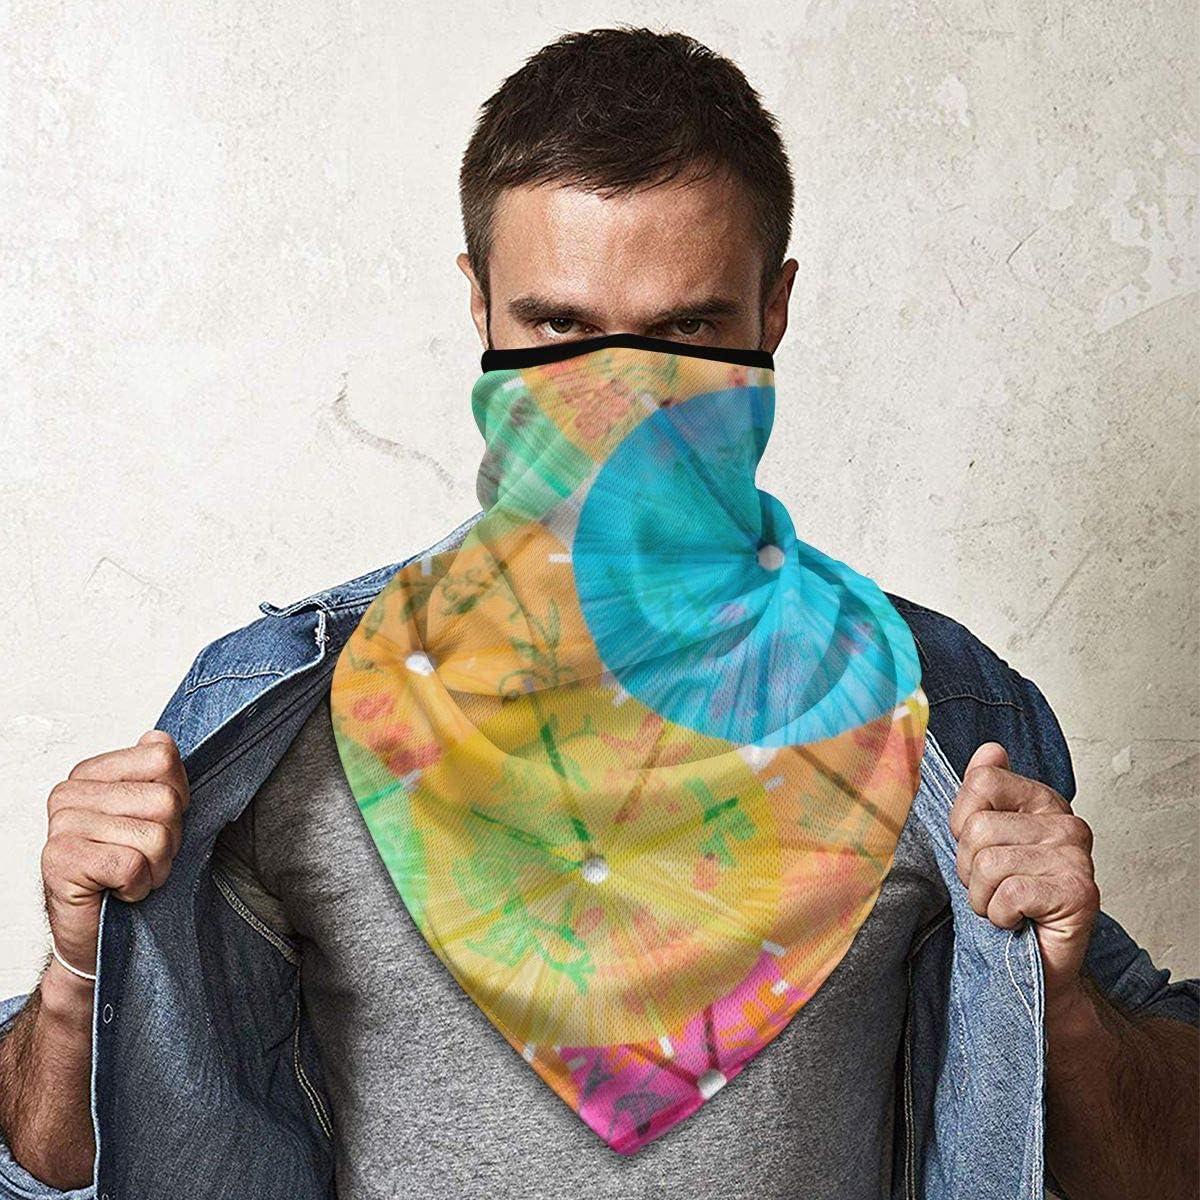 Colorful Mosaics Background Headband Face Mask Bandana Head Wrap Scarf Neck Warmer Headwear Balaclava For Sports